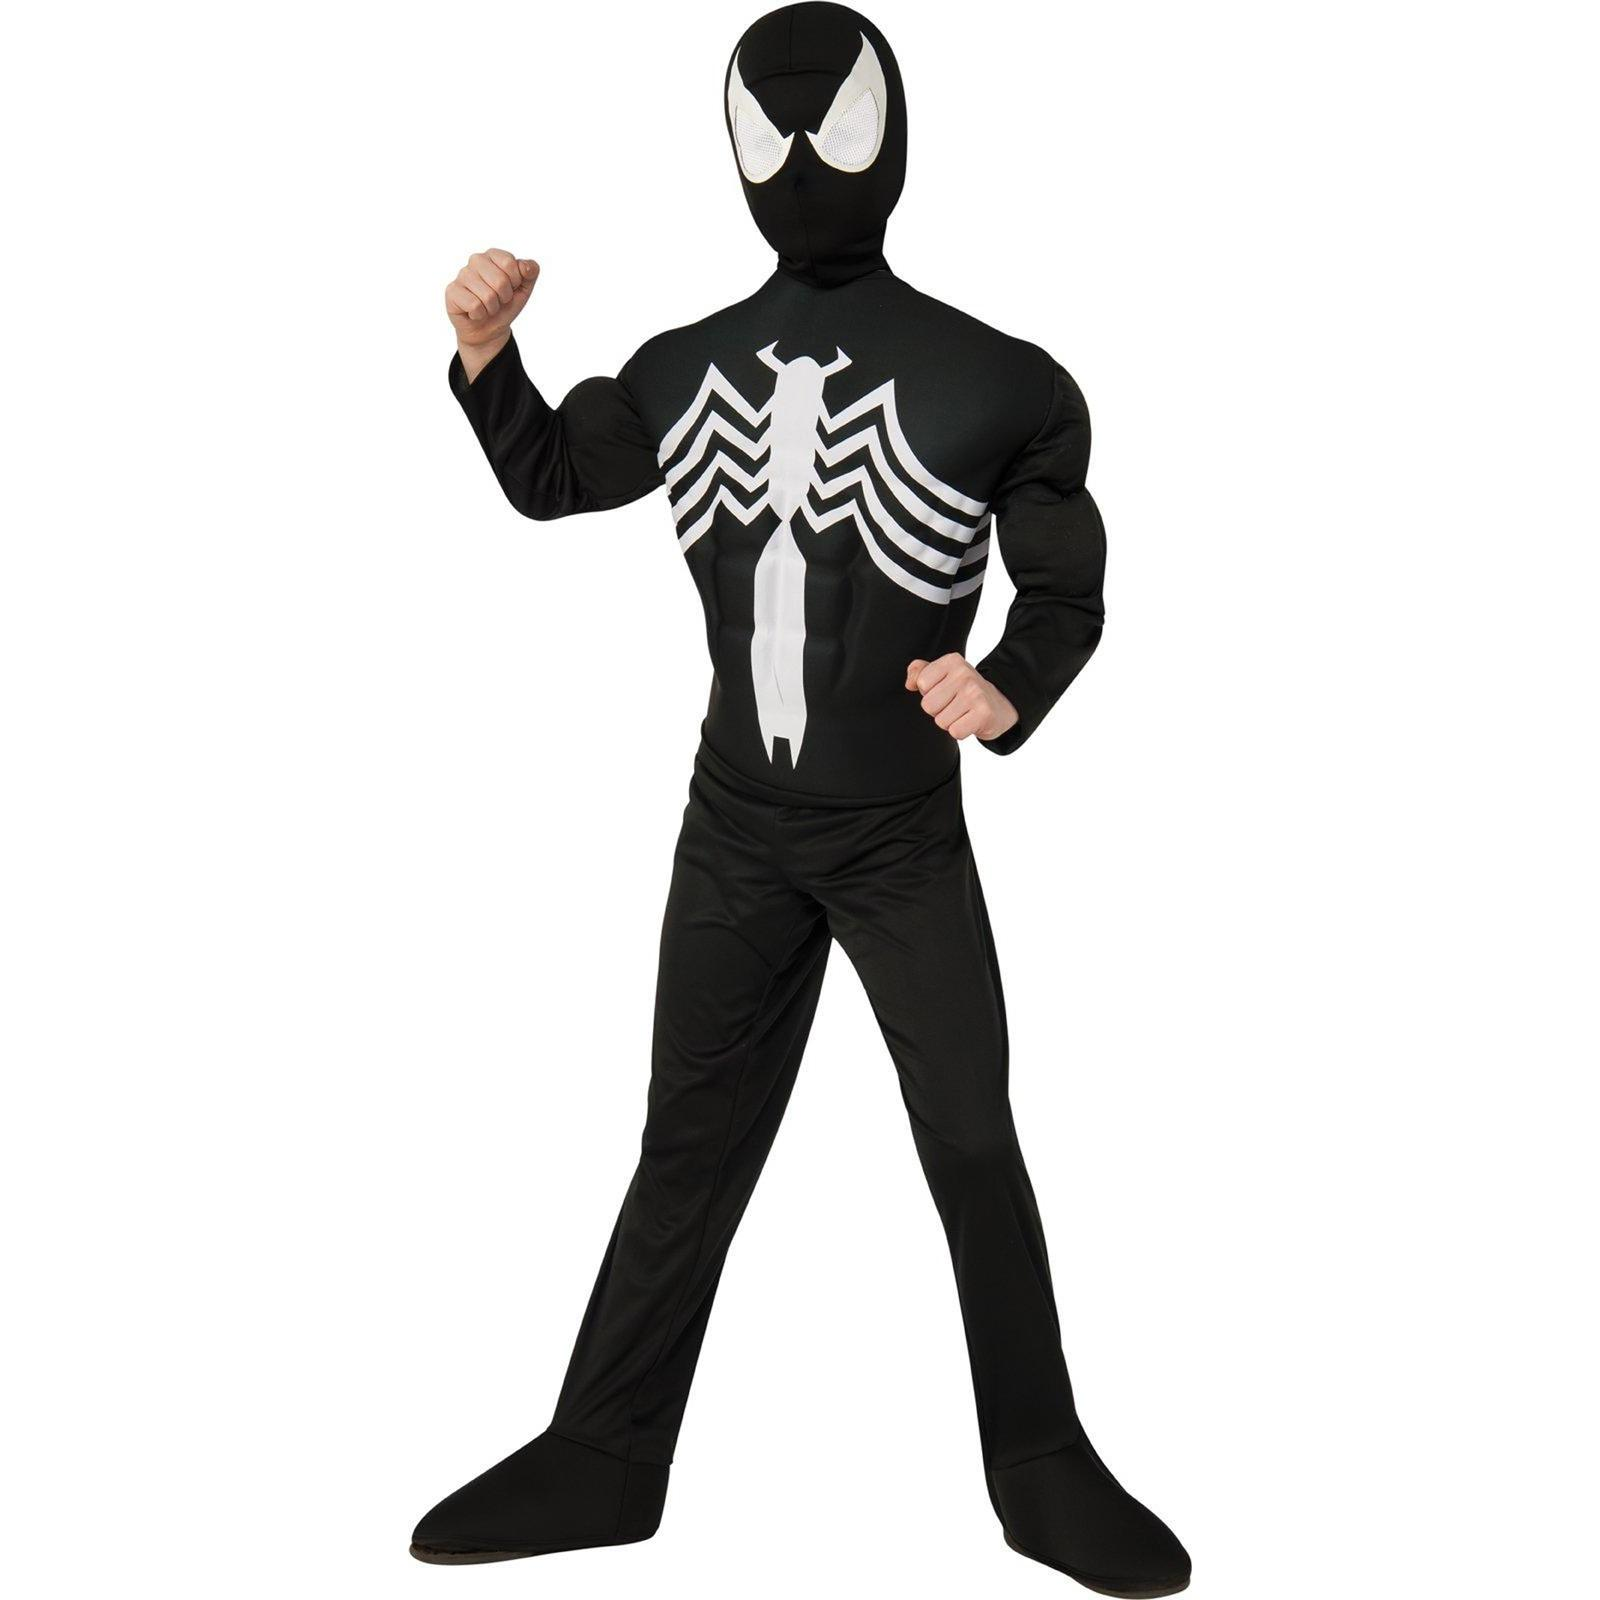 Spider Man Costumes